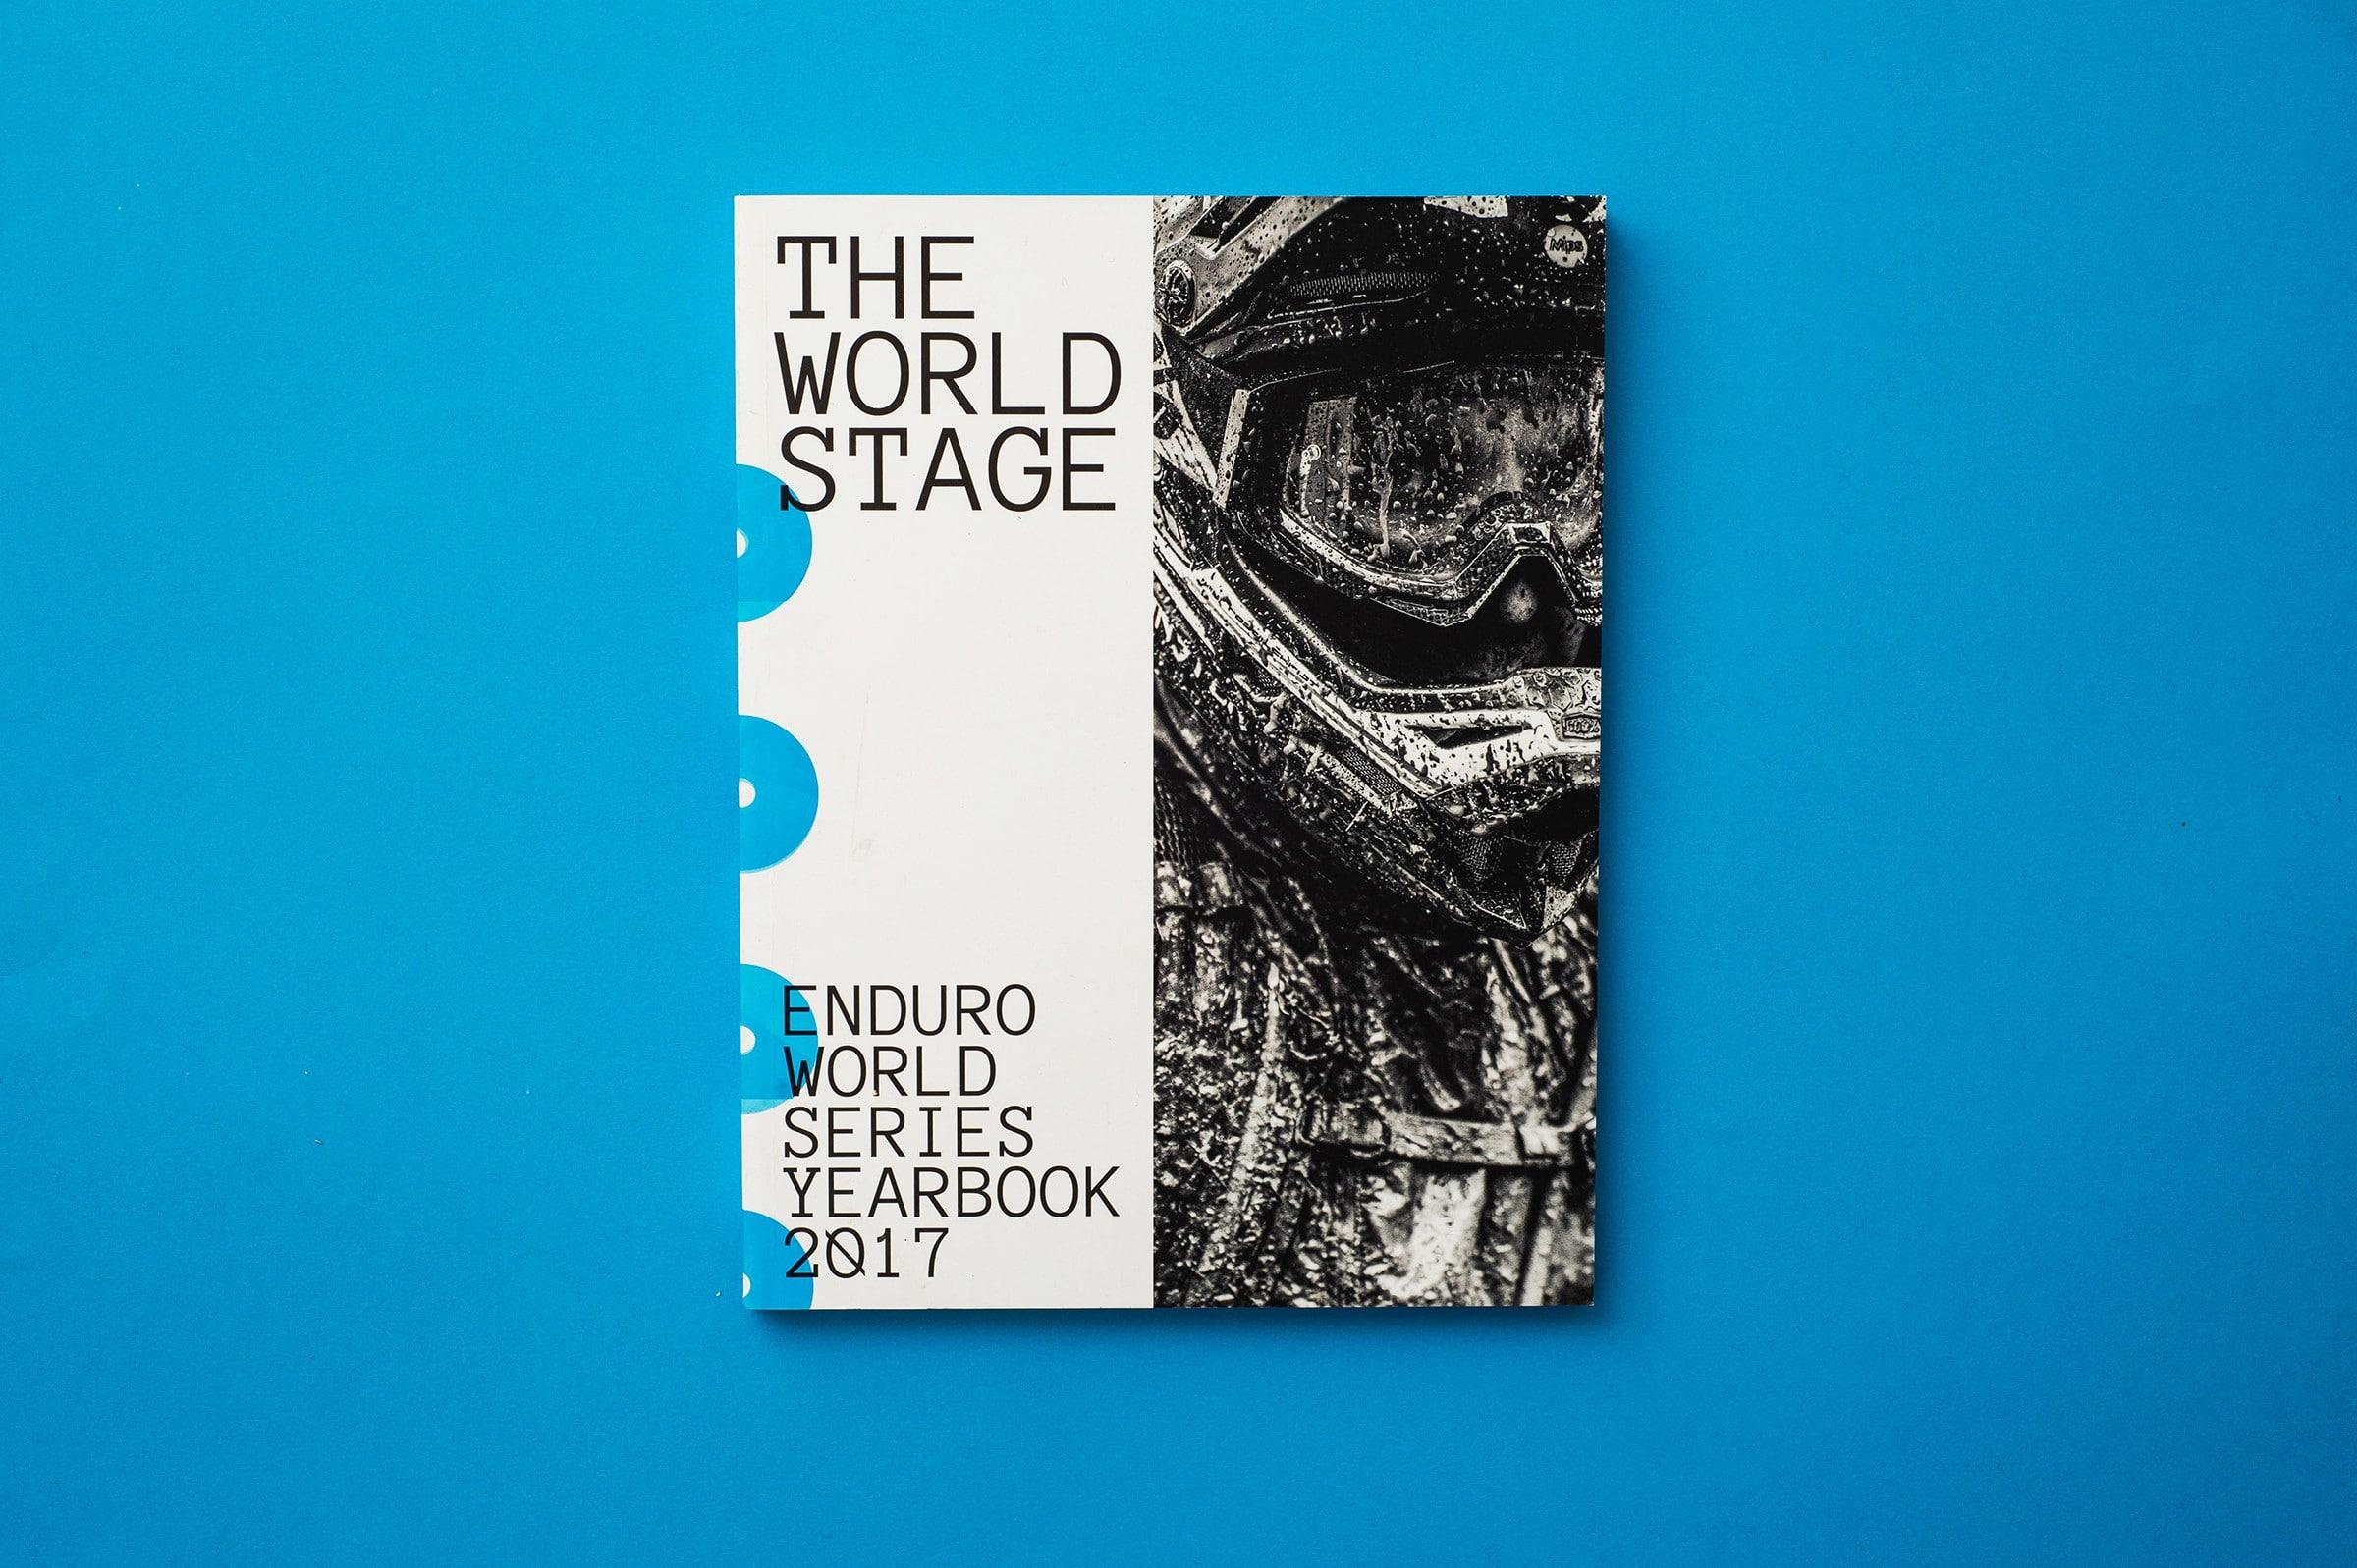 Enduro World Series book